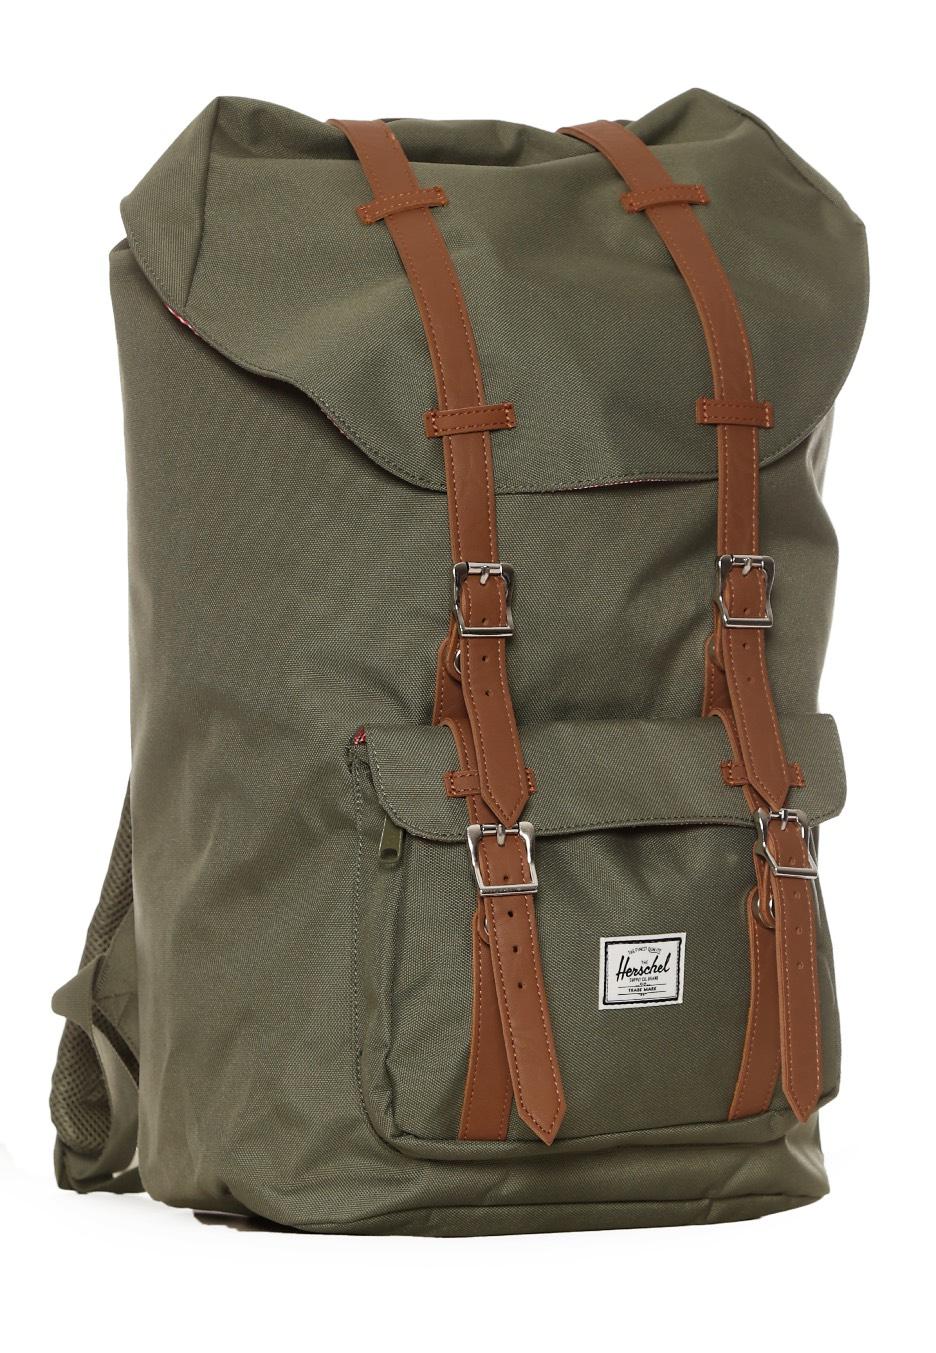 herschel little america deep lichen green tan synthetic leather backpack streetwear shop. Black Bedroom Furniture Sets. Home Design Ideas